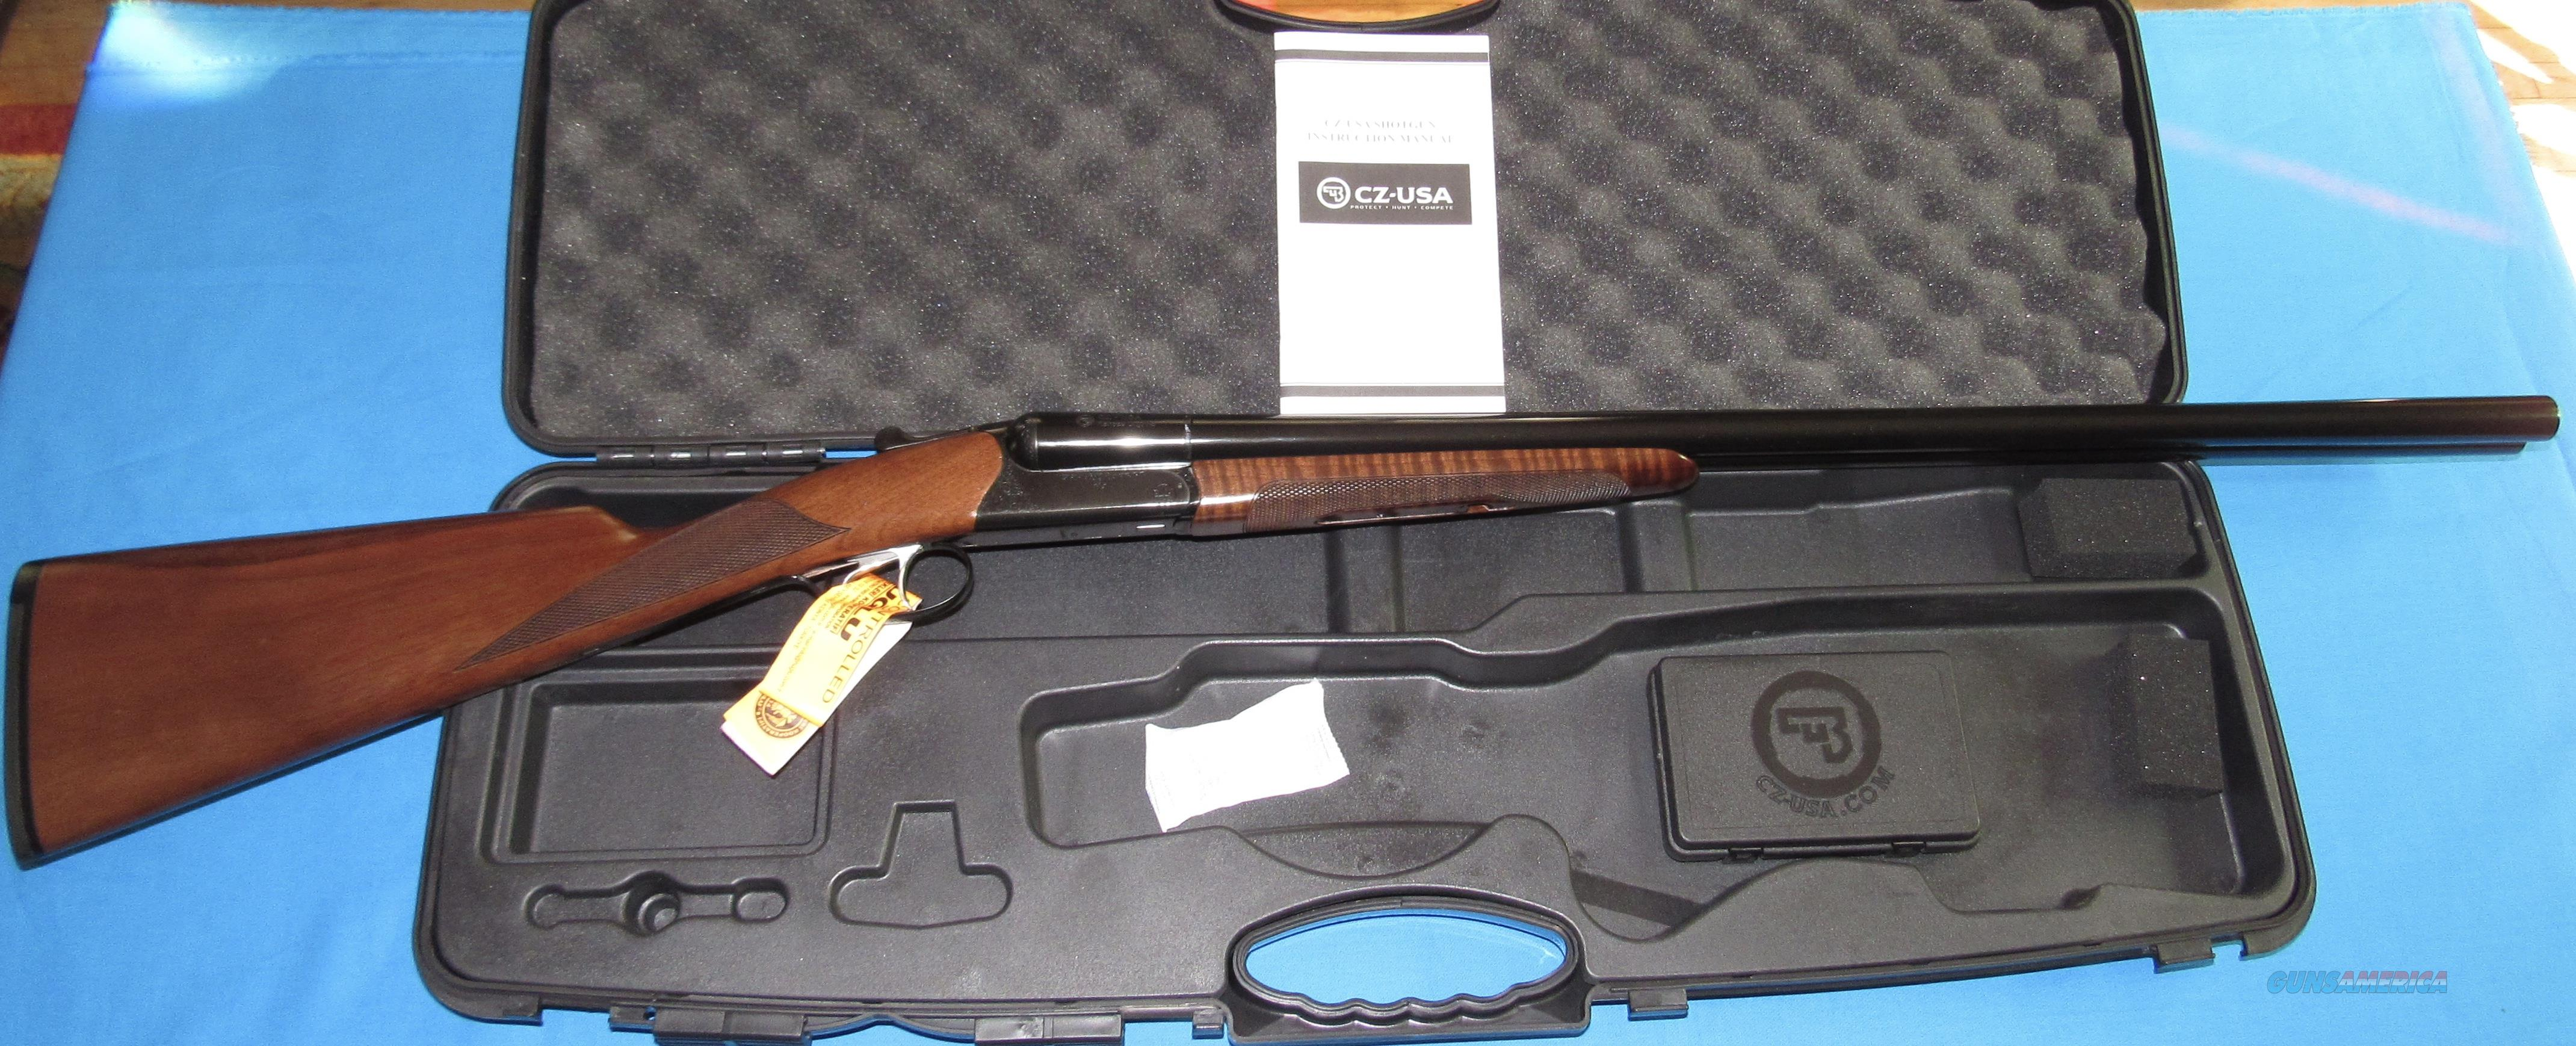 CZ BOBWHITE G2 12 GAUGE DOUBLE BARREL SHOTGUN  Guns > Shotguns > CZ Shotguns